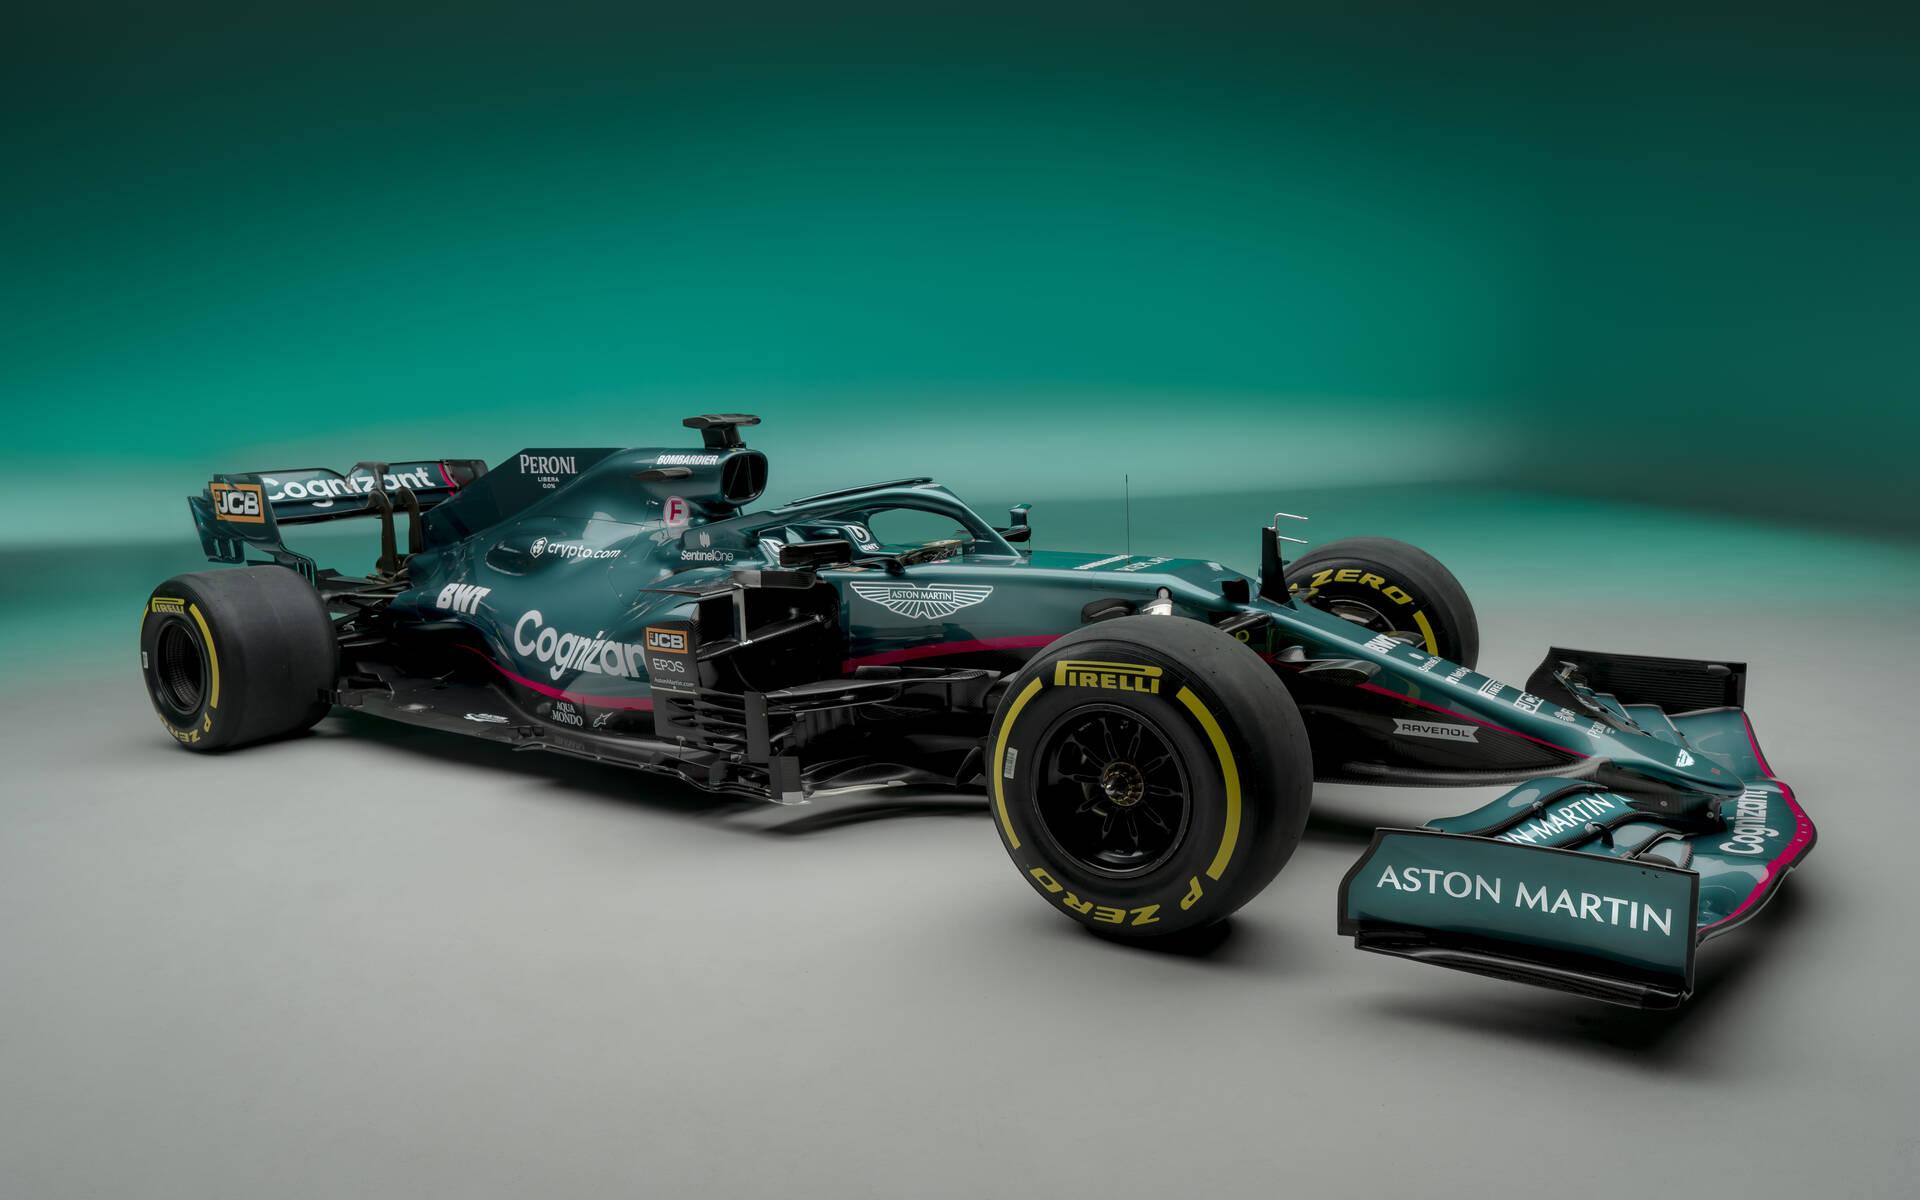 <p>Aston Martin Cognizant F1</p>